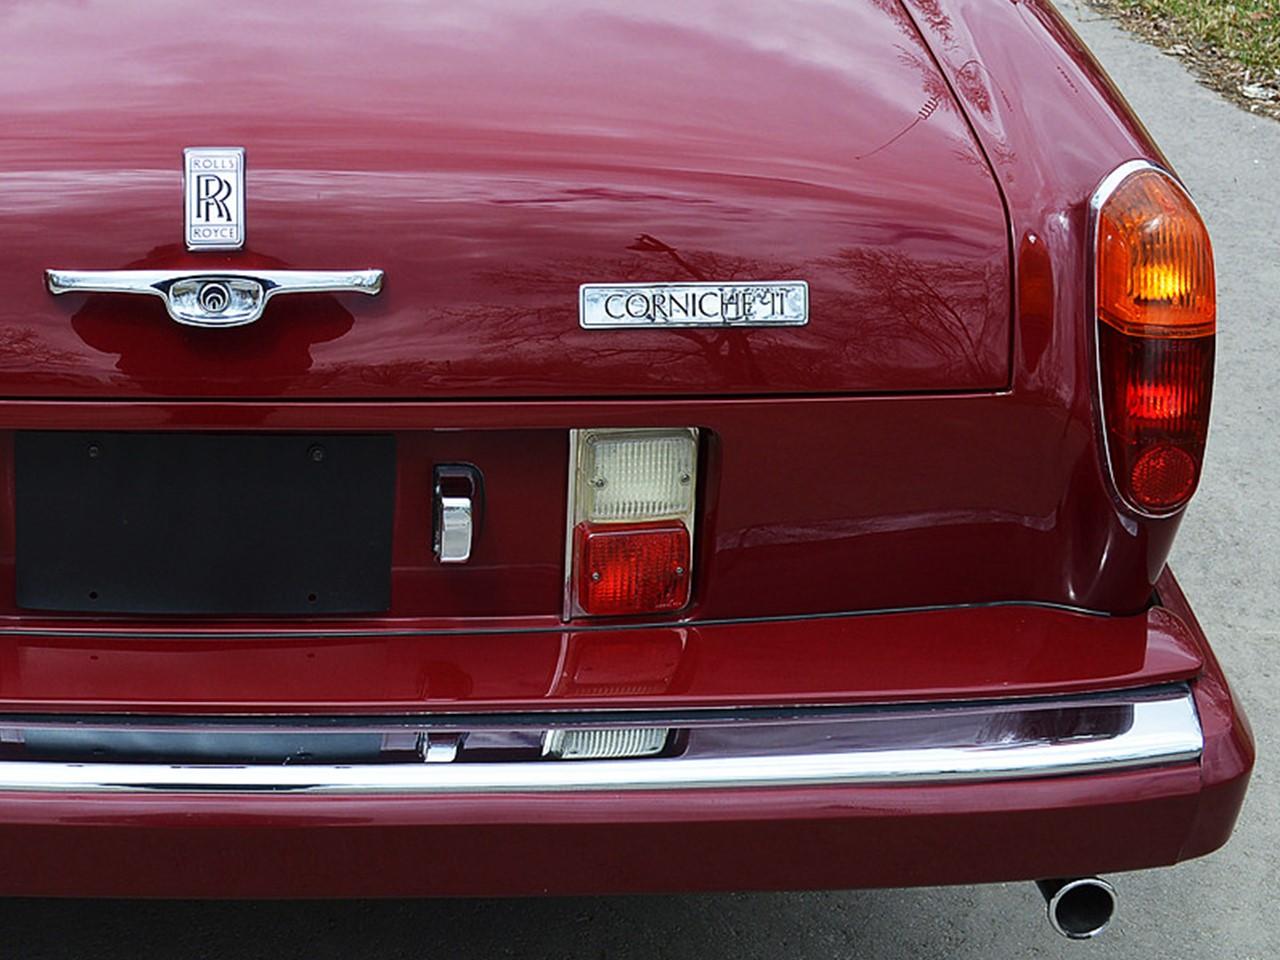 1986 Corniche II 1